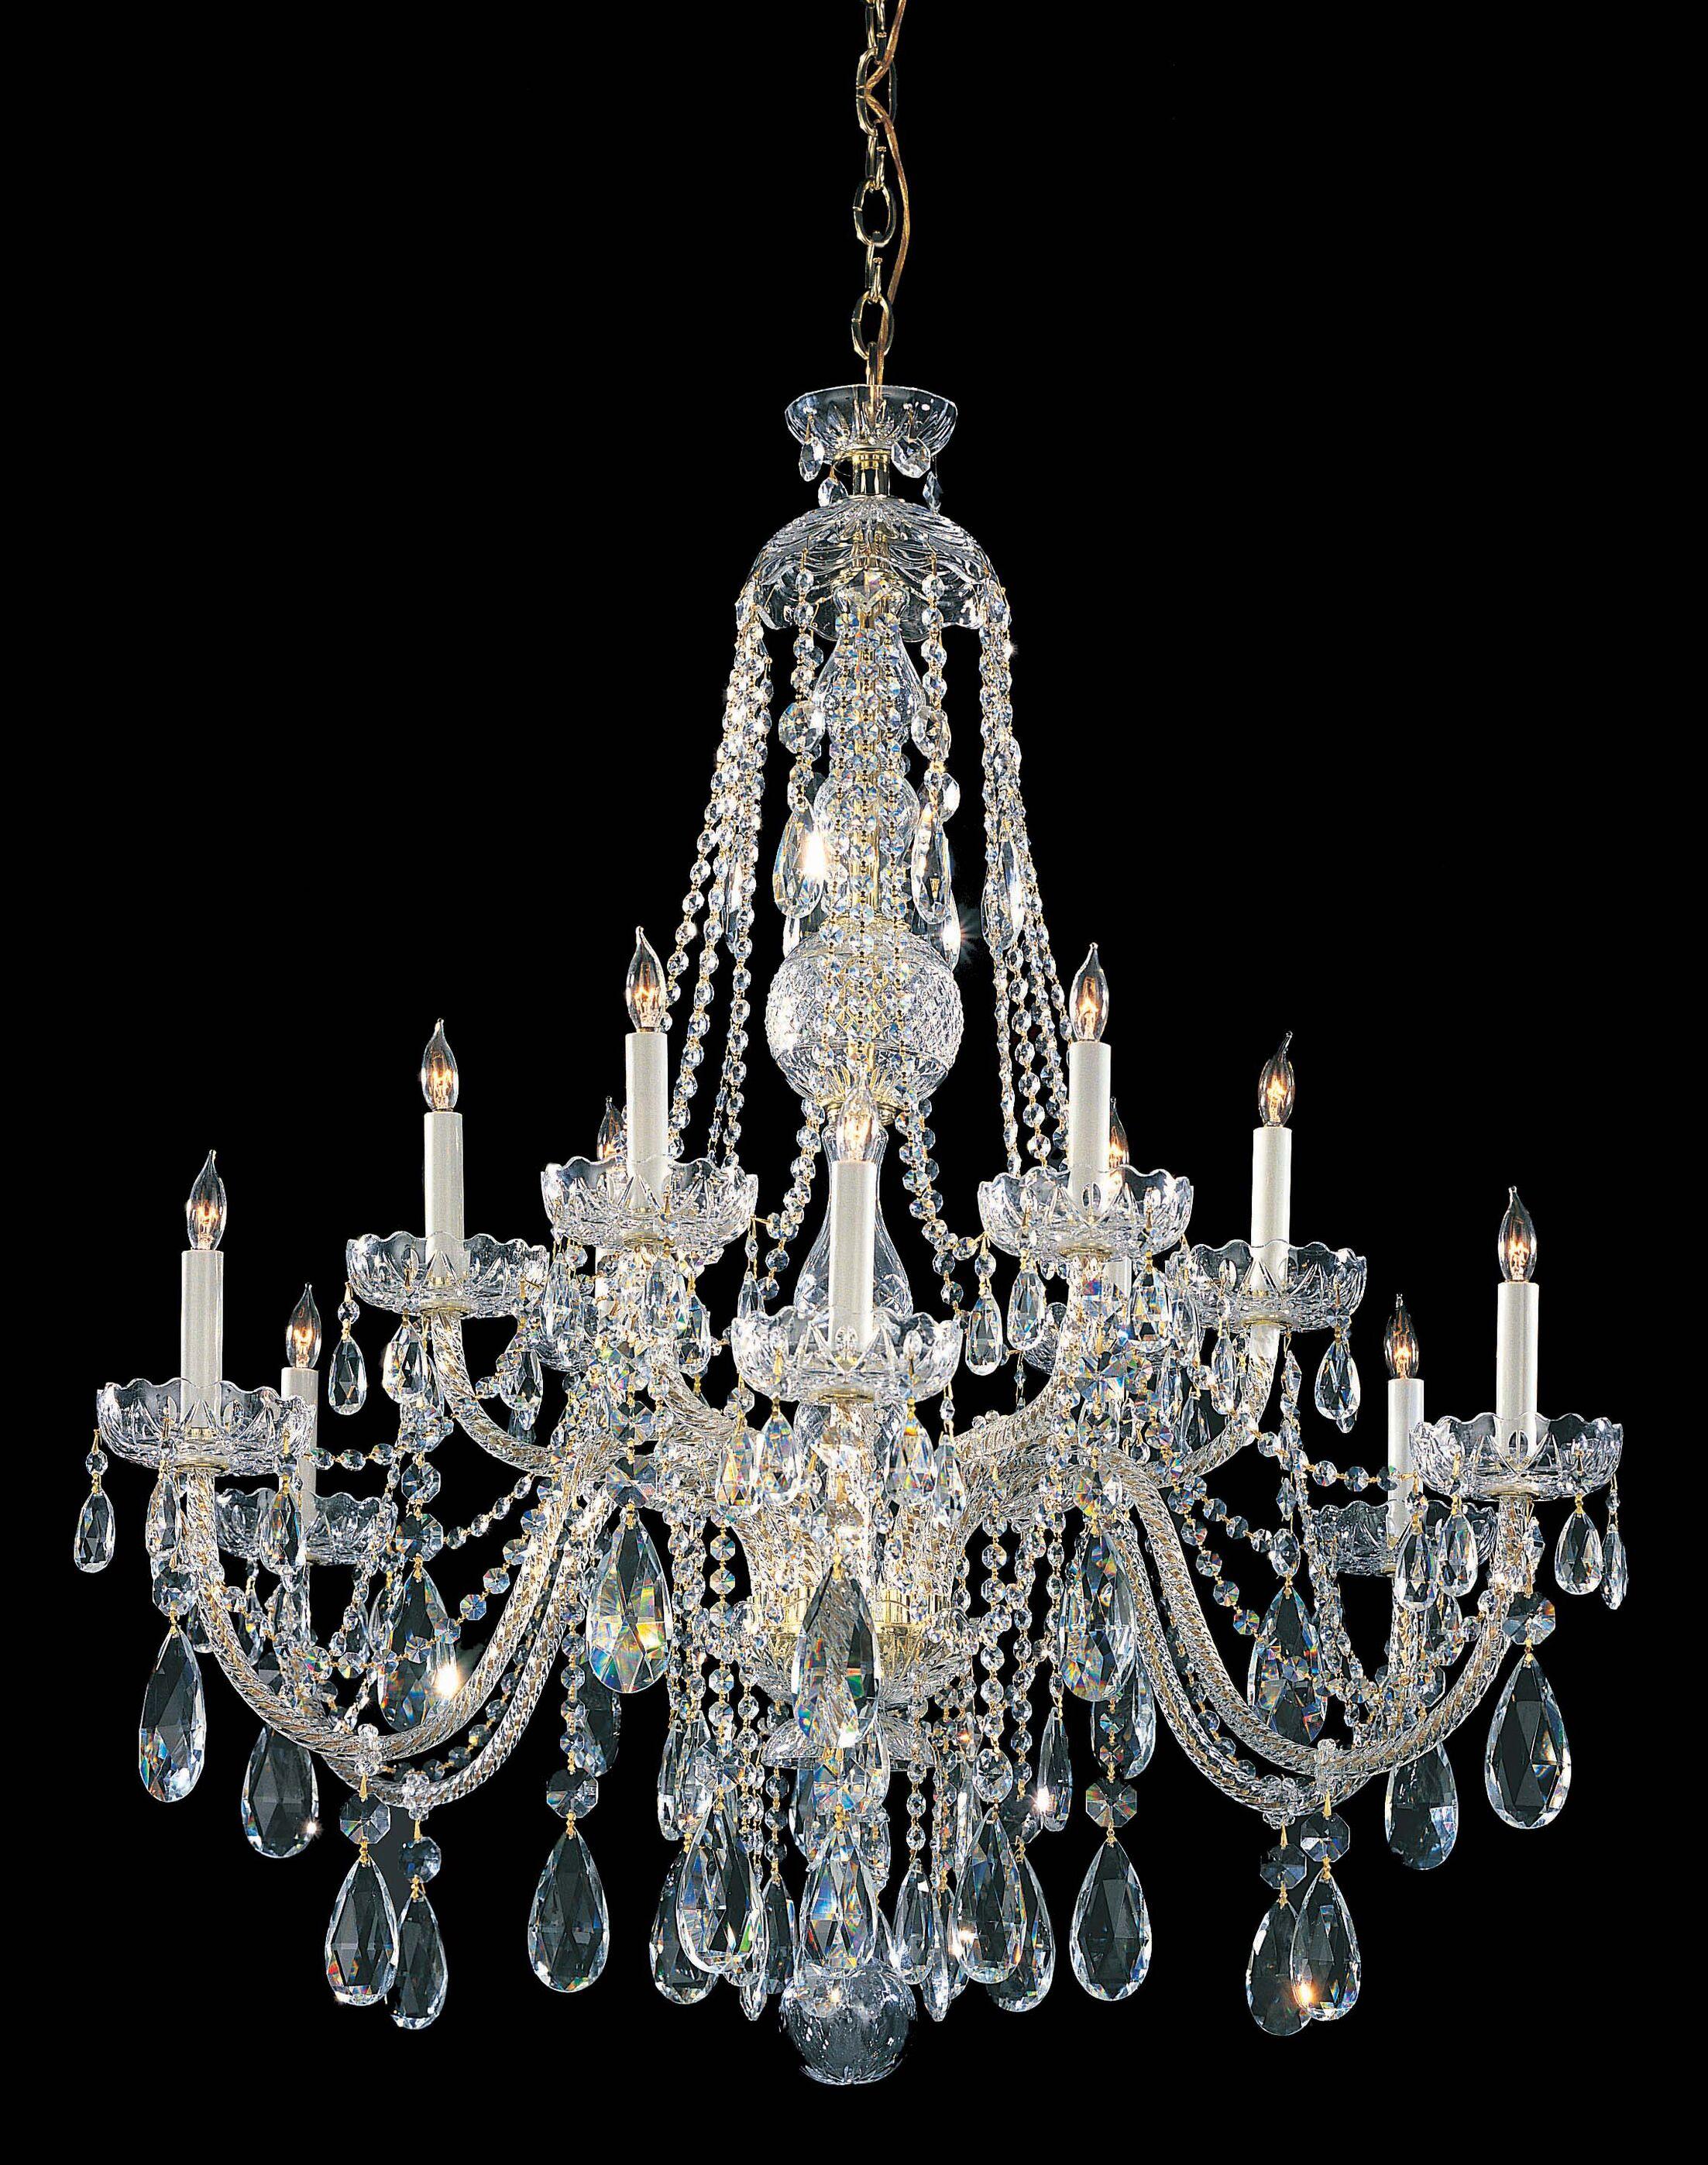 Milan 12-Light Candle Style Chandelier Finish: Polished Brass, Crystal Type: Majestic Wood Polished